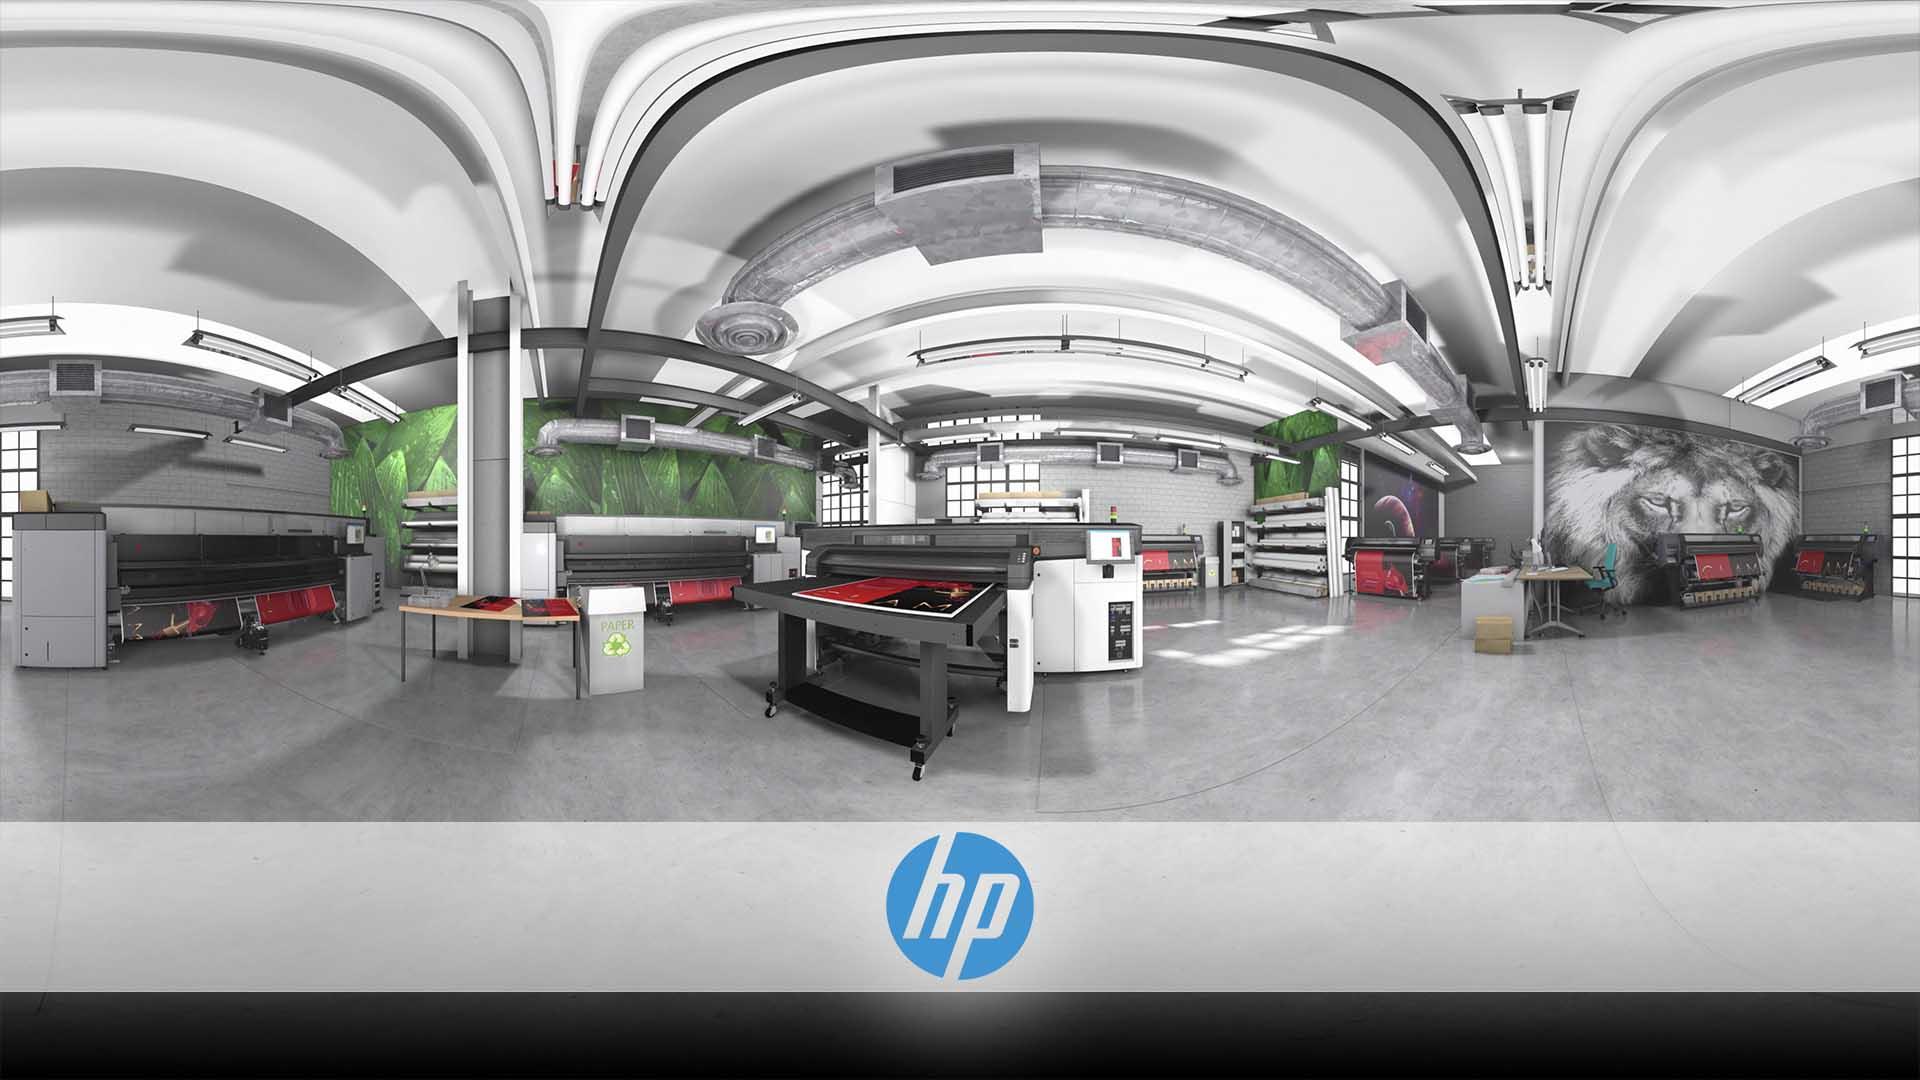 HP Printer VR Showroom